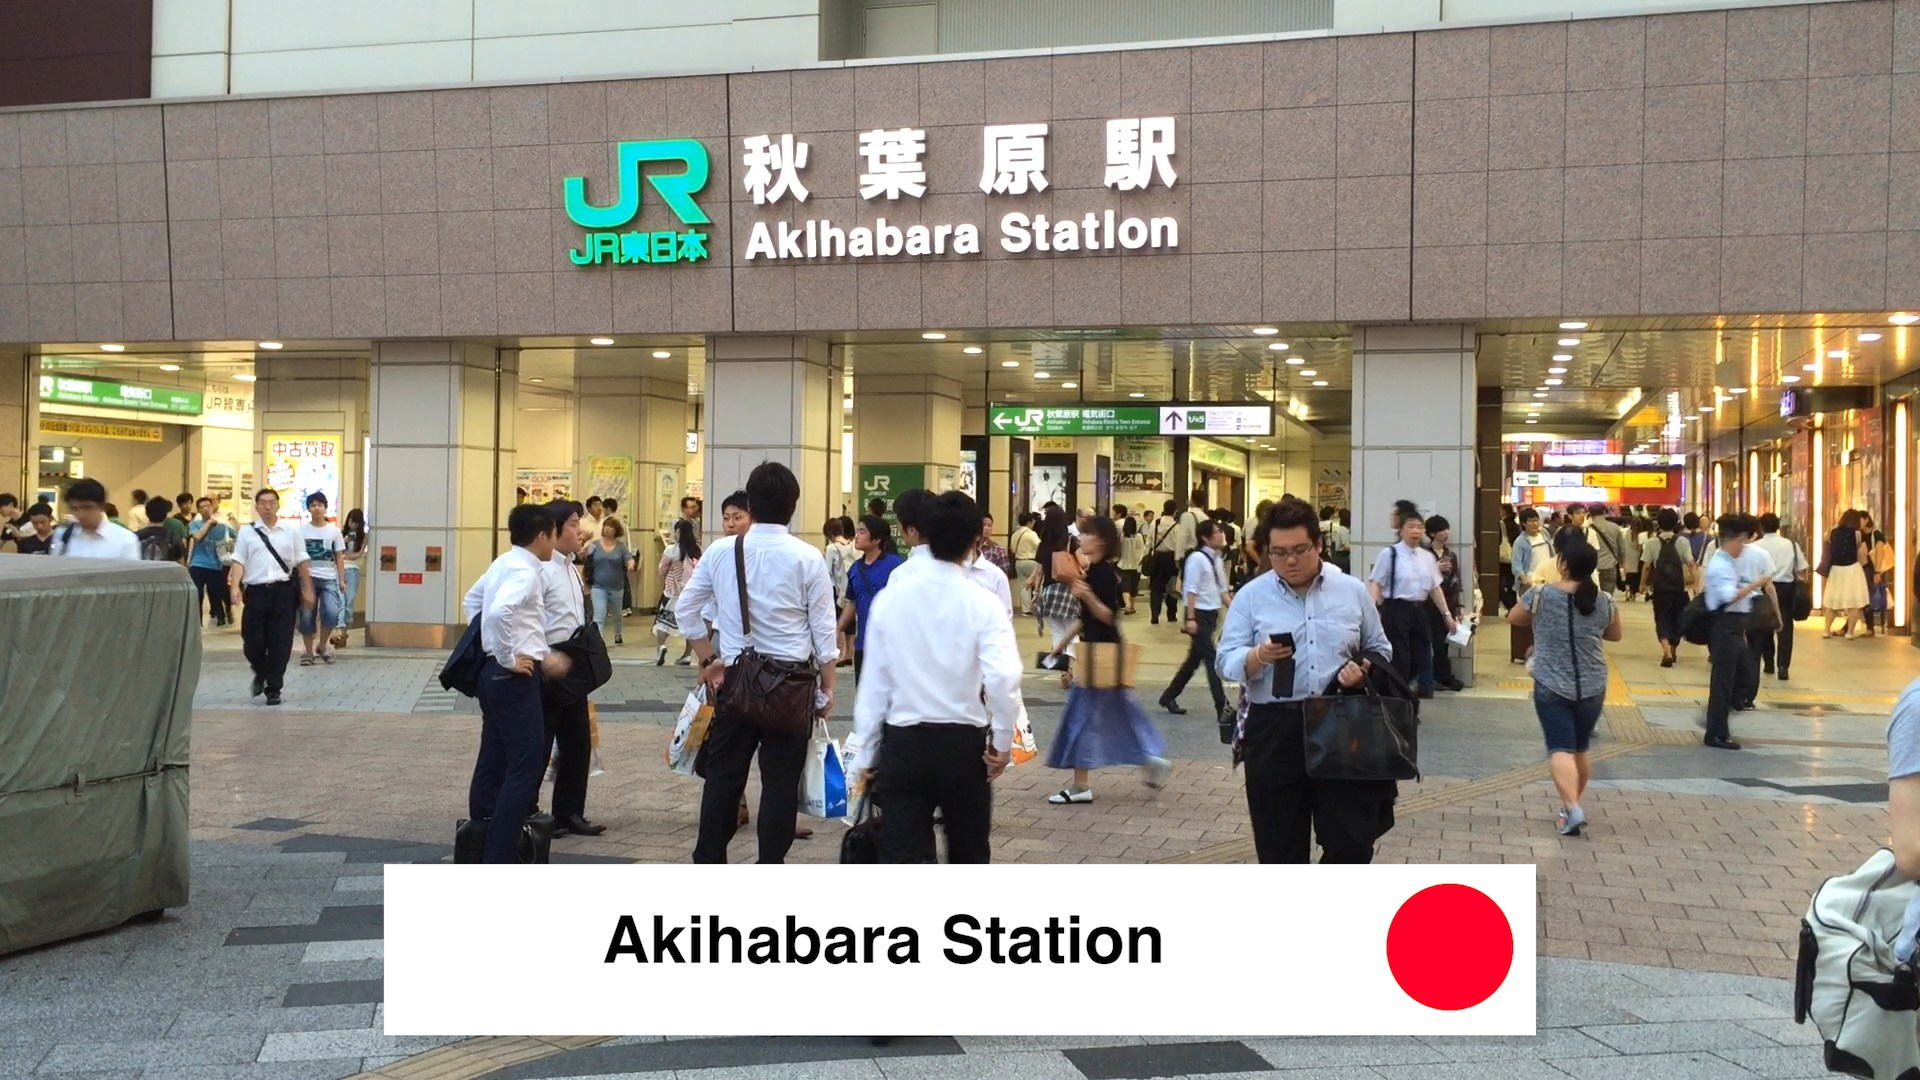 Akihabara Station - Walking Around Akihabara Tokyo What To Do 2018 - Loot Anime Discount Code 2018 🇯🇵 🏙 📦